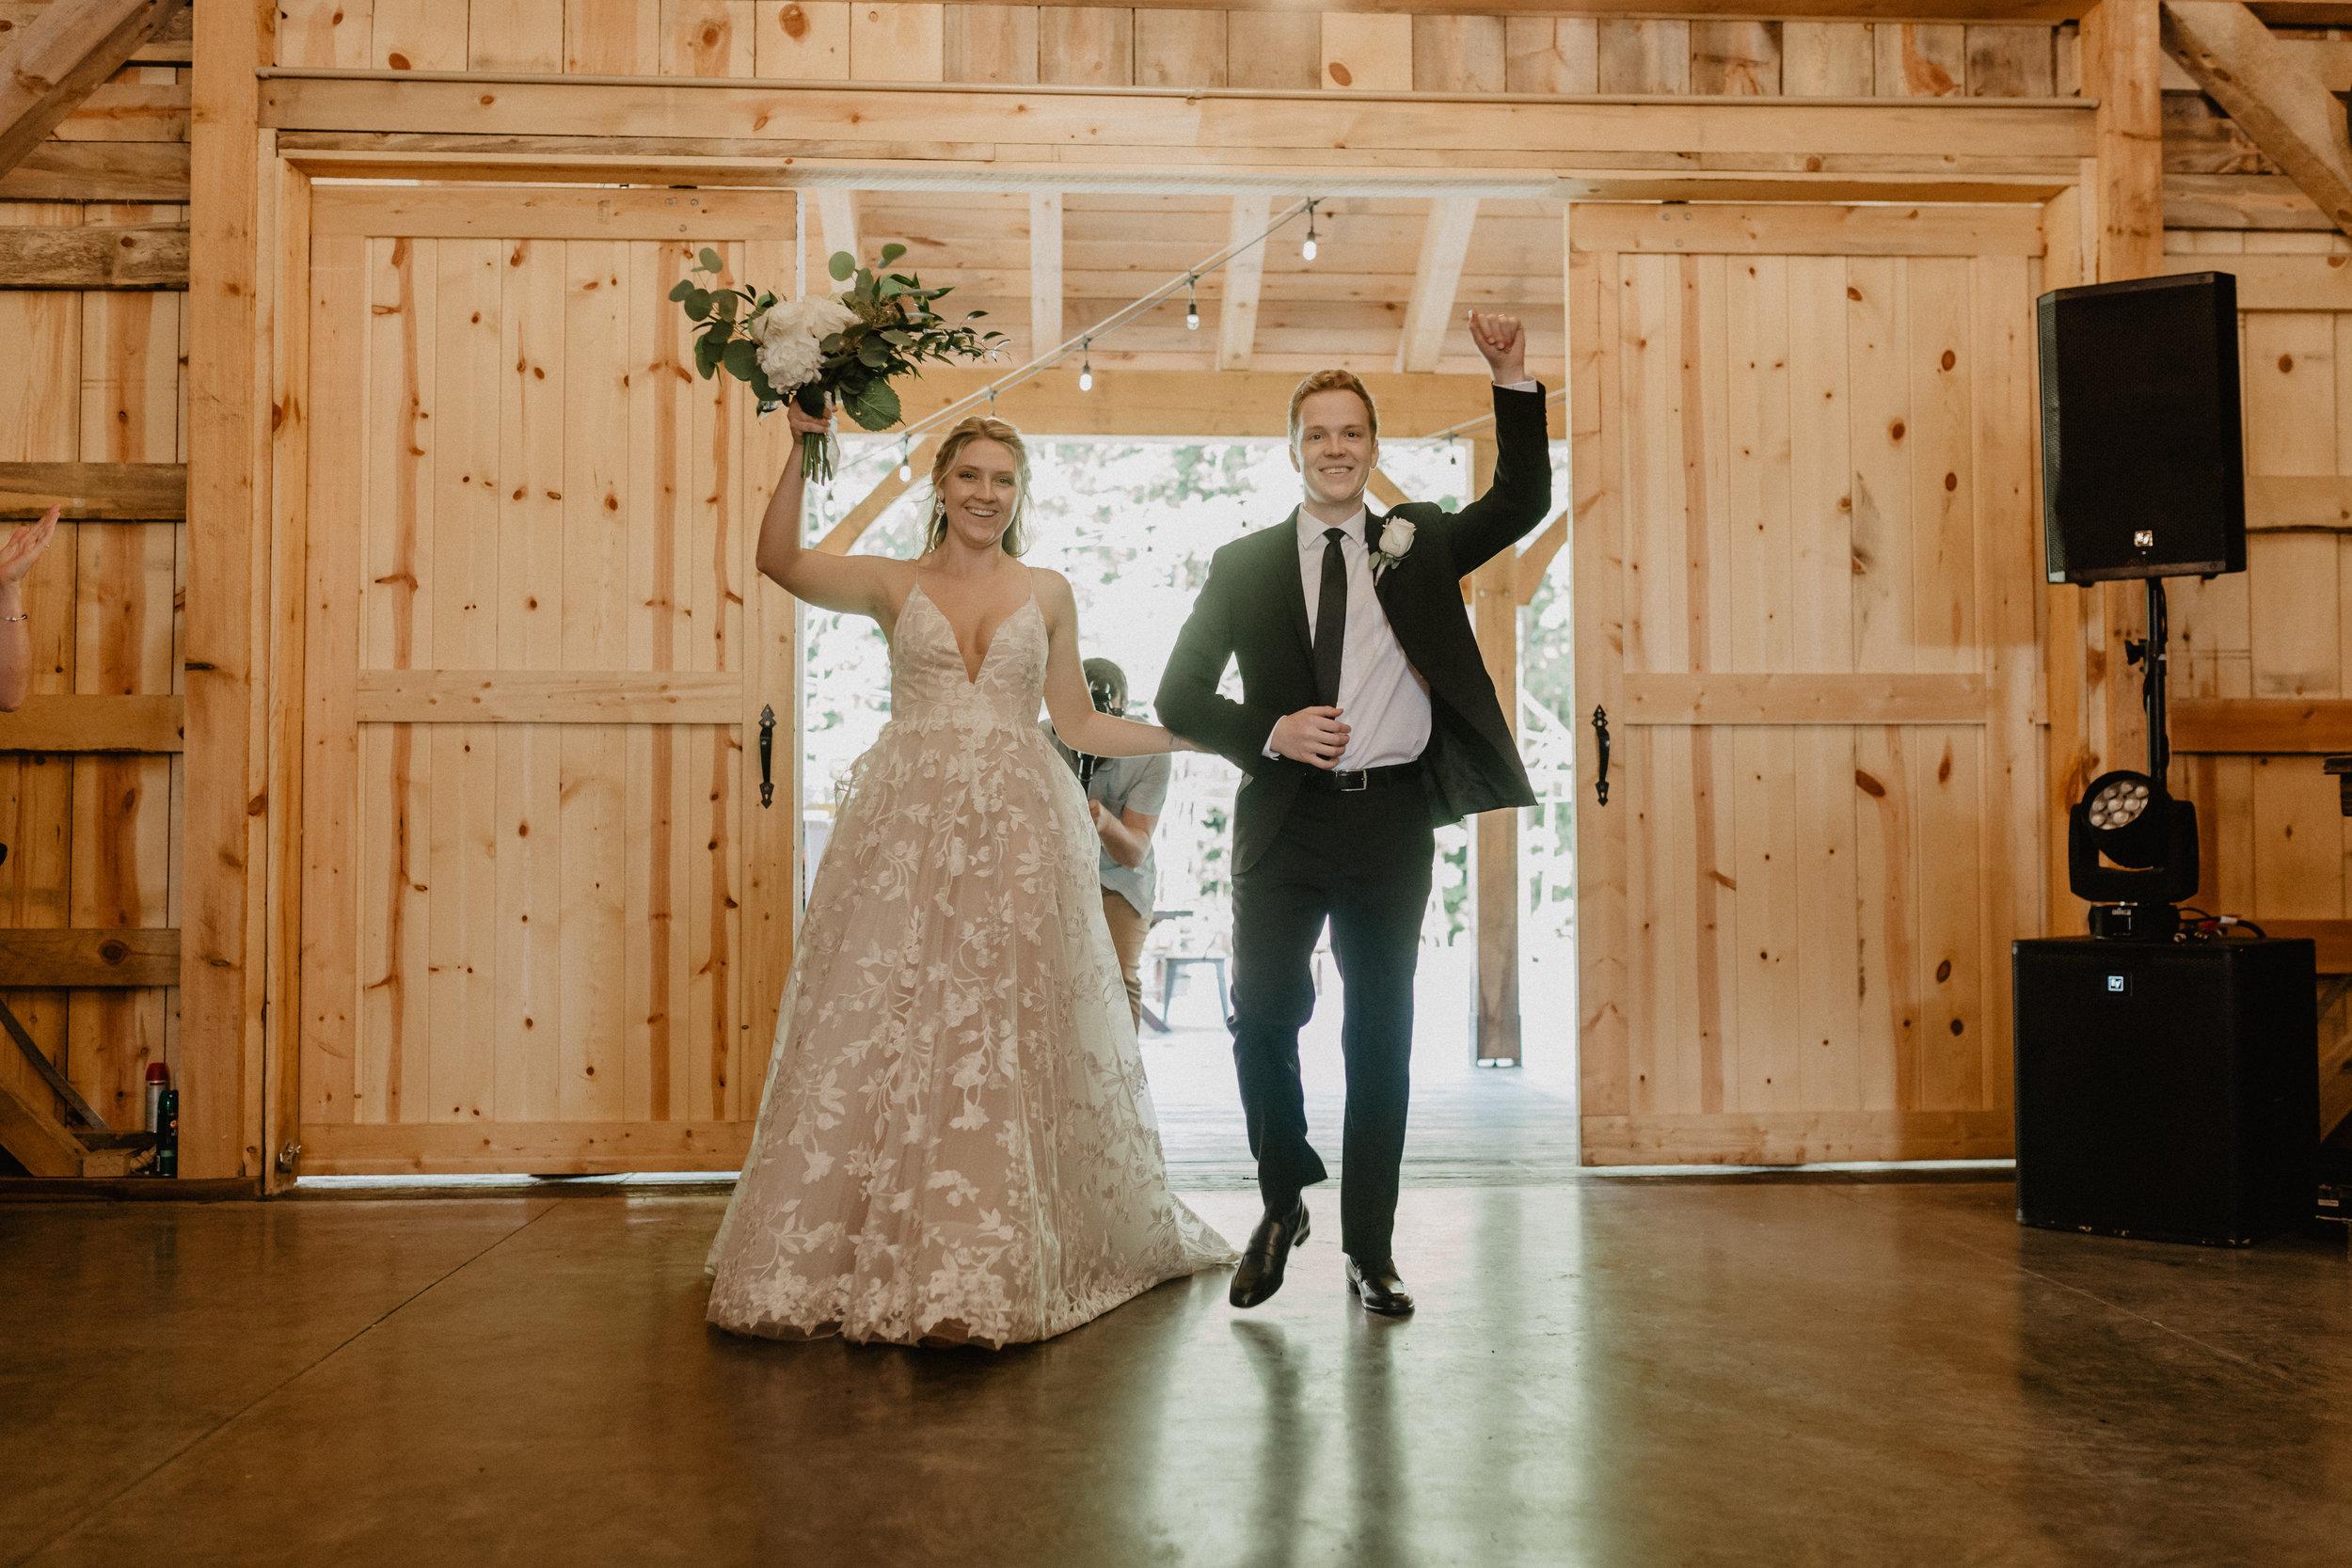 greywacke-meadows-wedding-49.jpg